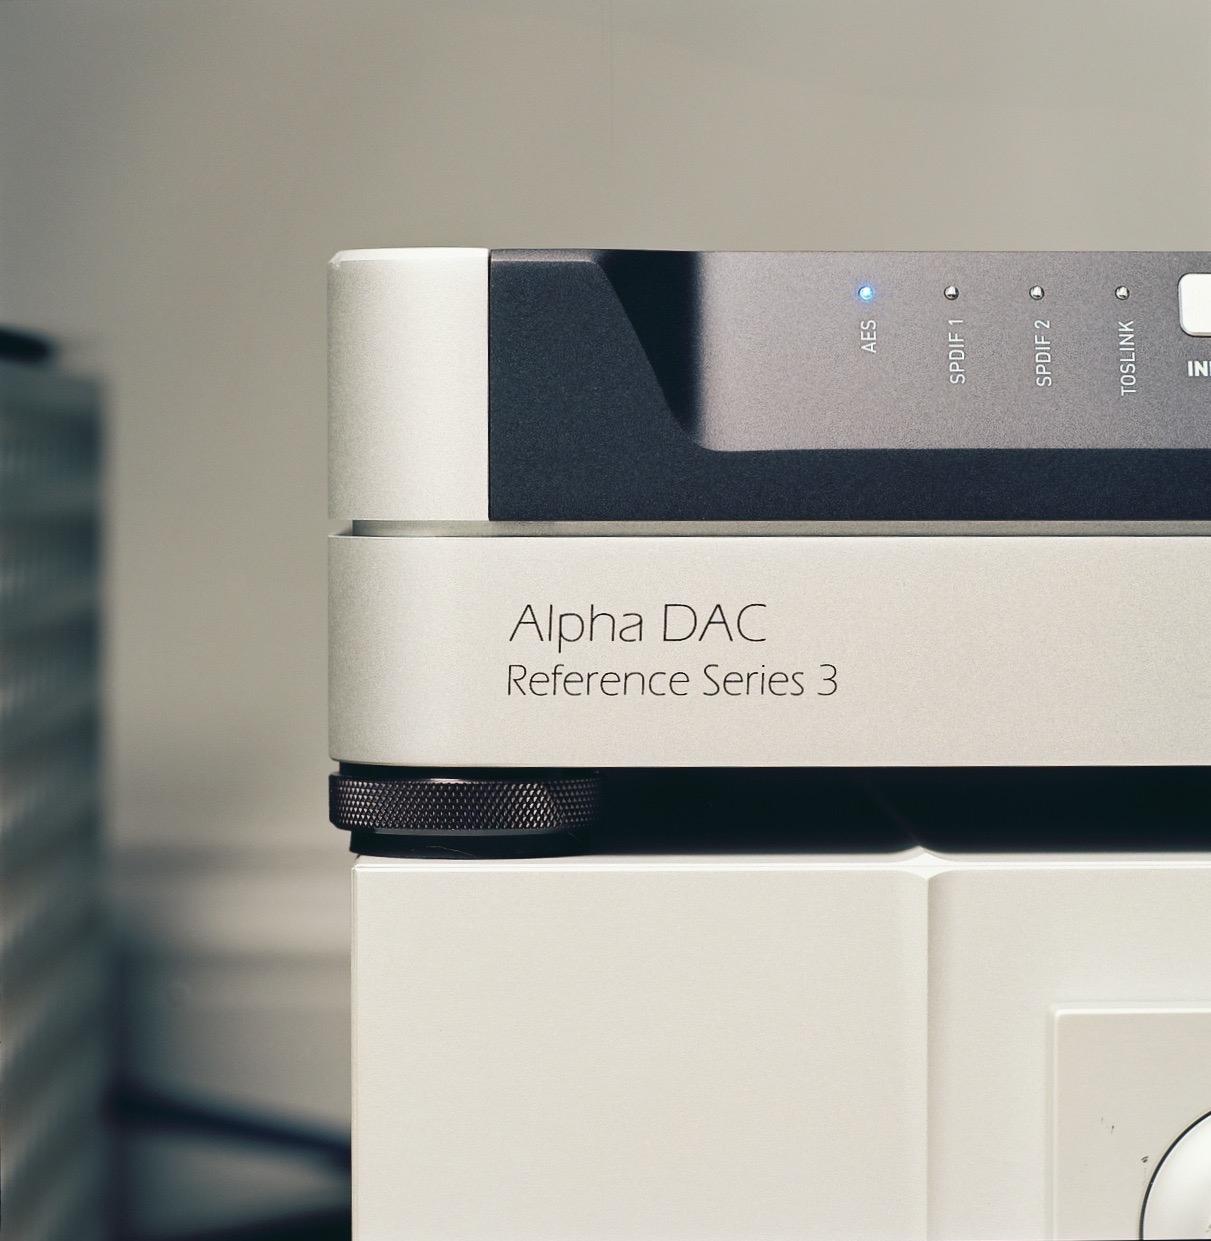 Review: Berkeley Audio Design Alpha DAC Reference Series 3